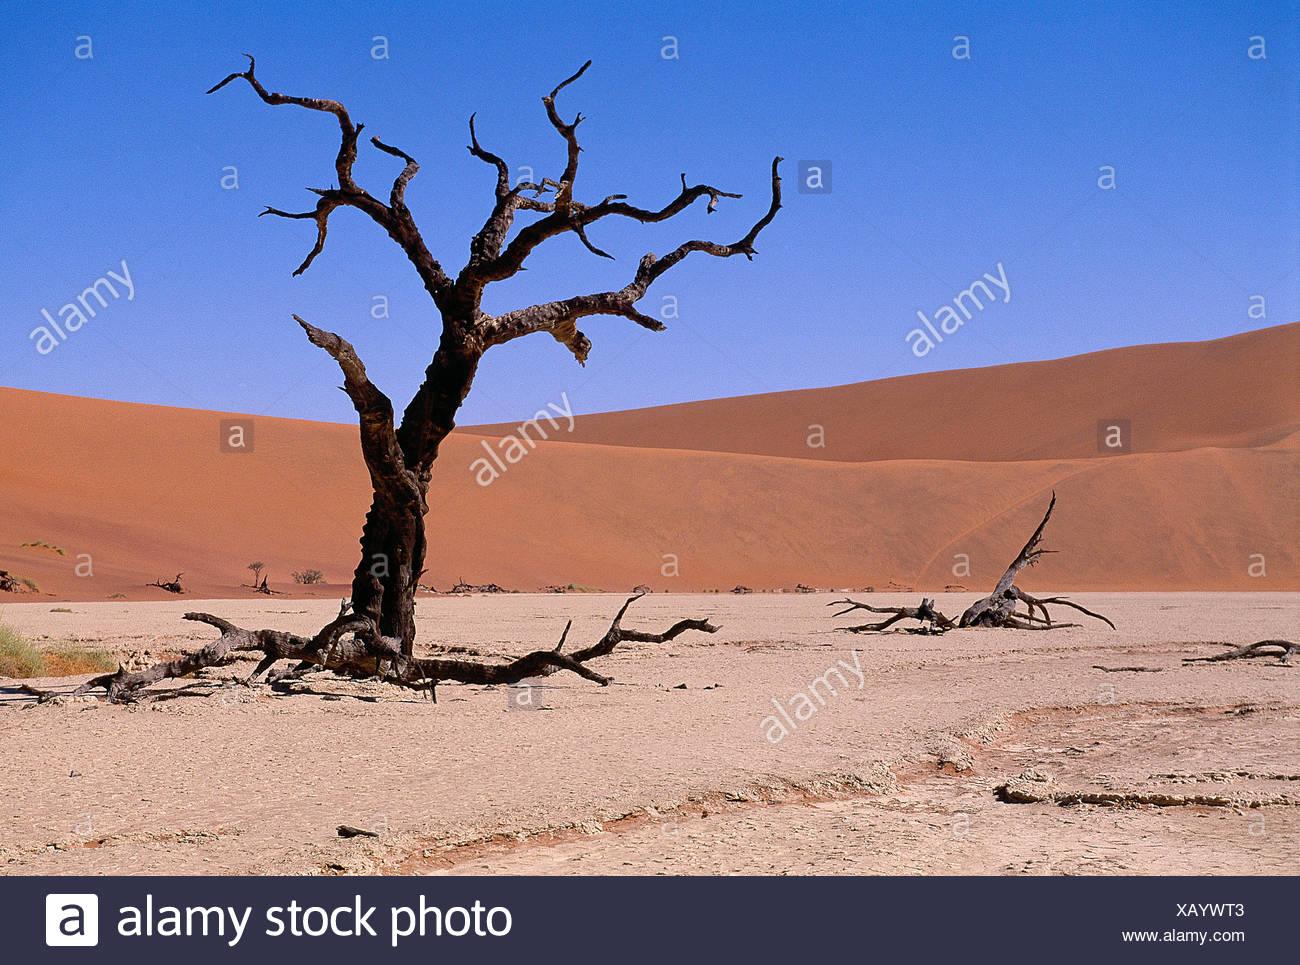 Namibia. Deadvlei desert landscape with dead trees. - Stock Image